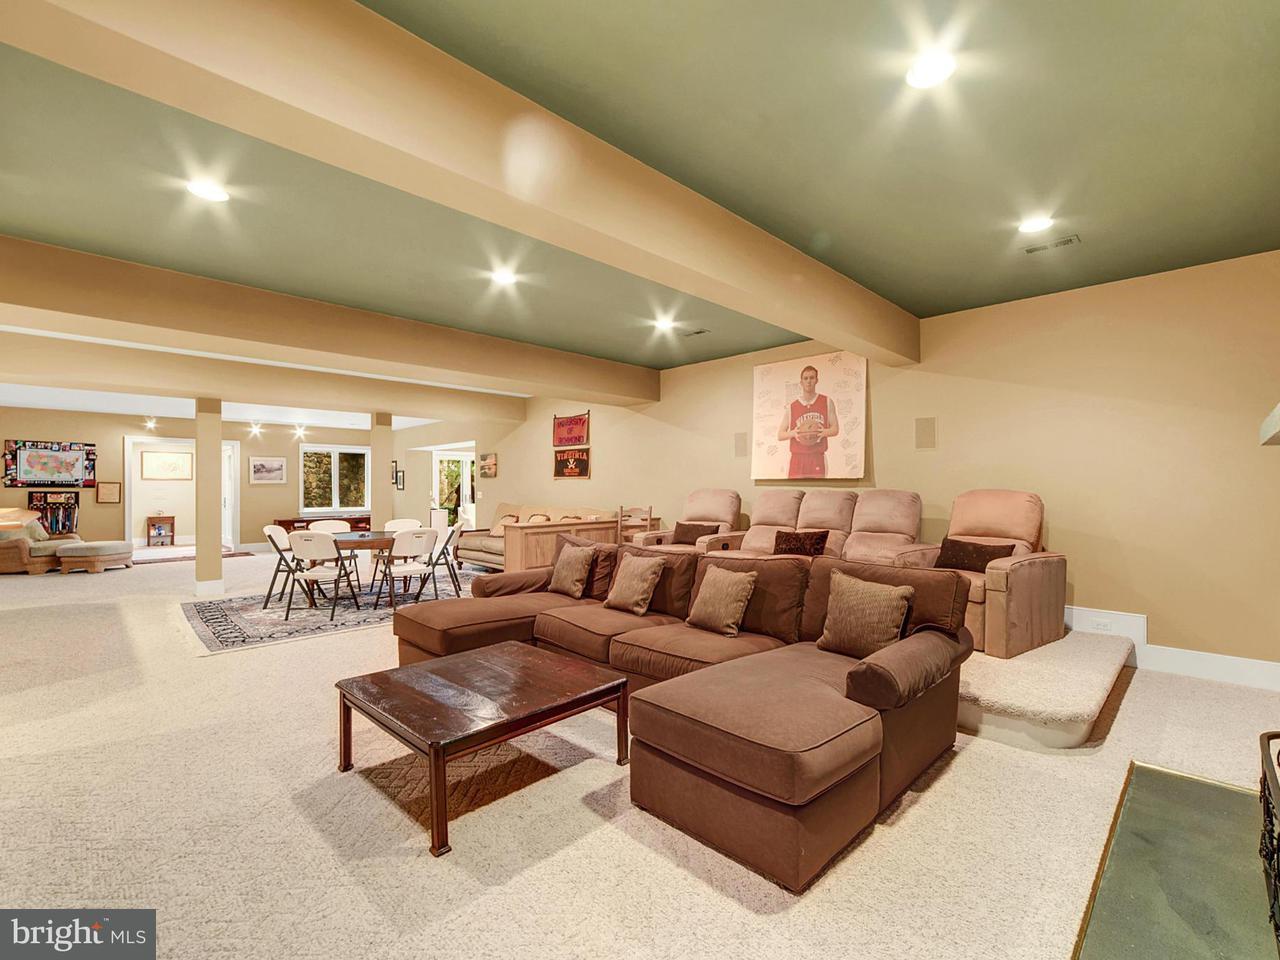 Additional photo for property listing at 9255 HARTS MILL Road 9255 HARTS MILL Road Warrenton, Virginia 20186 Stati Uniti